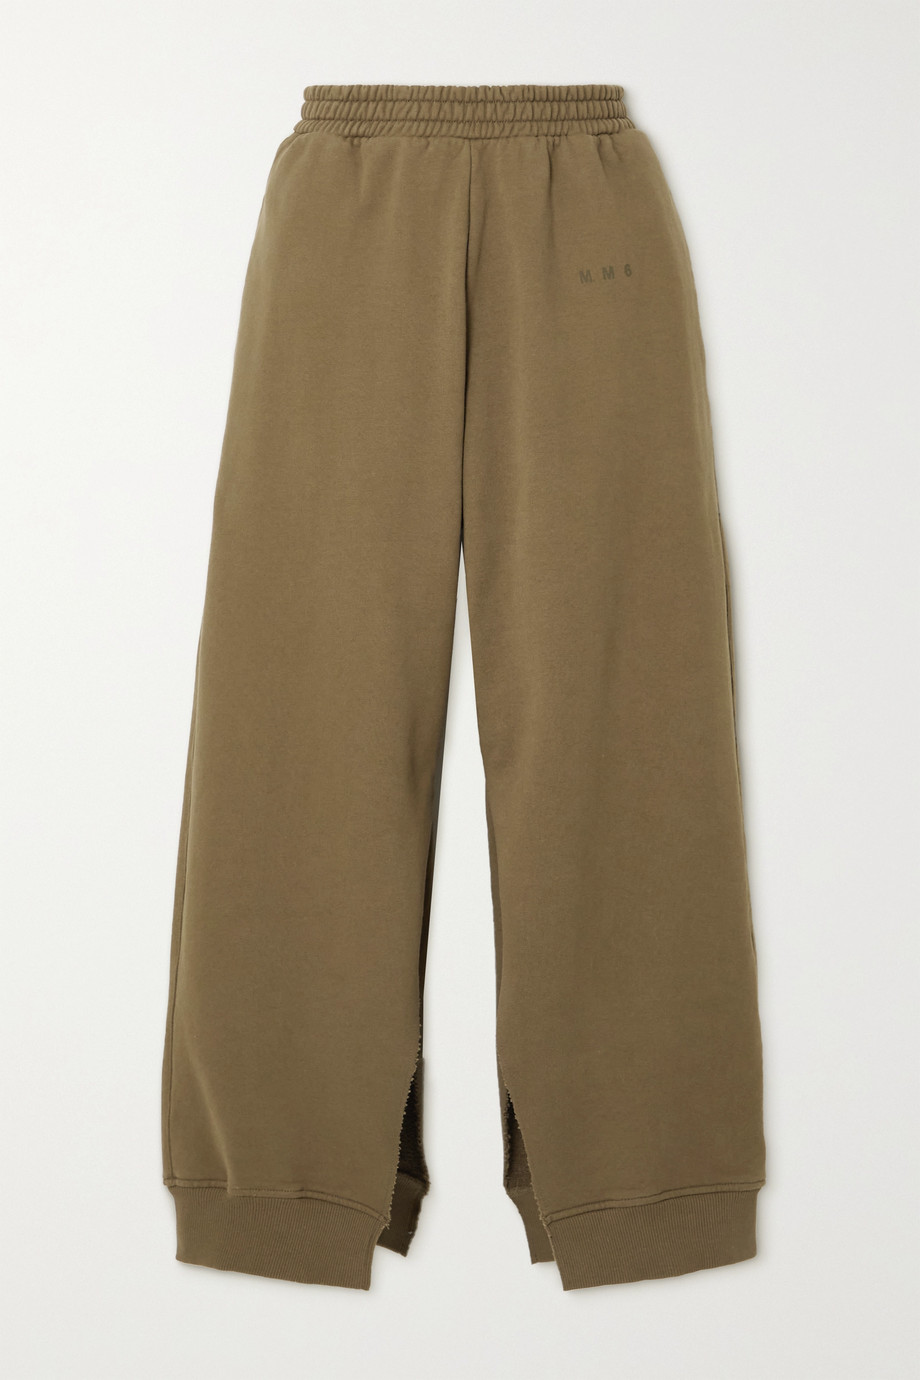 MM6 Maison Margiela Distressed cotton-jersey track pants